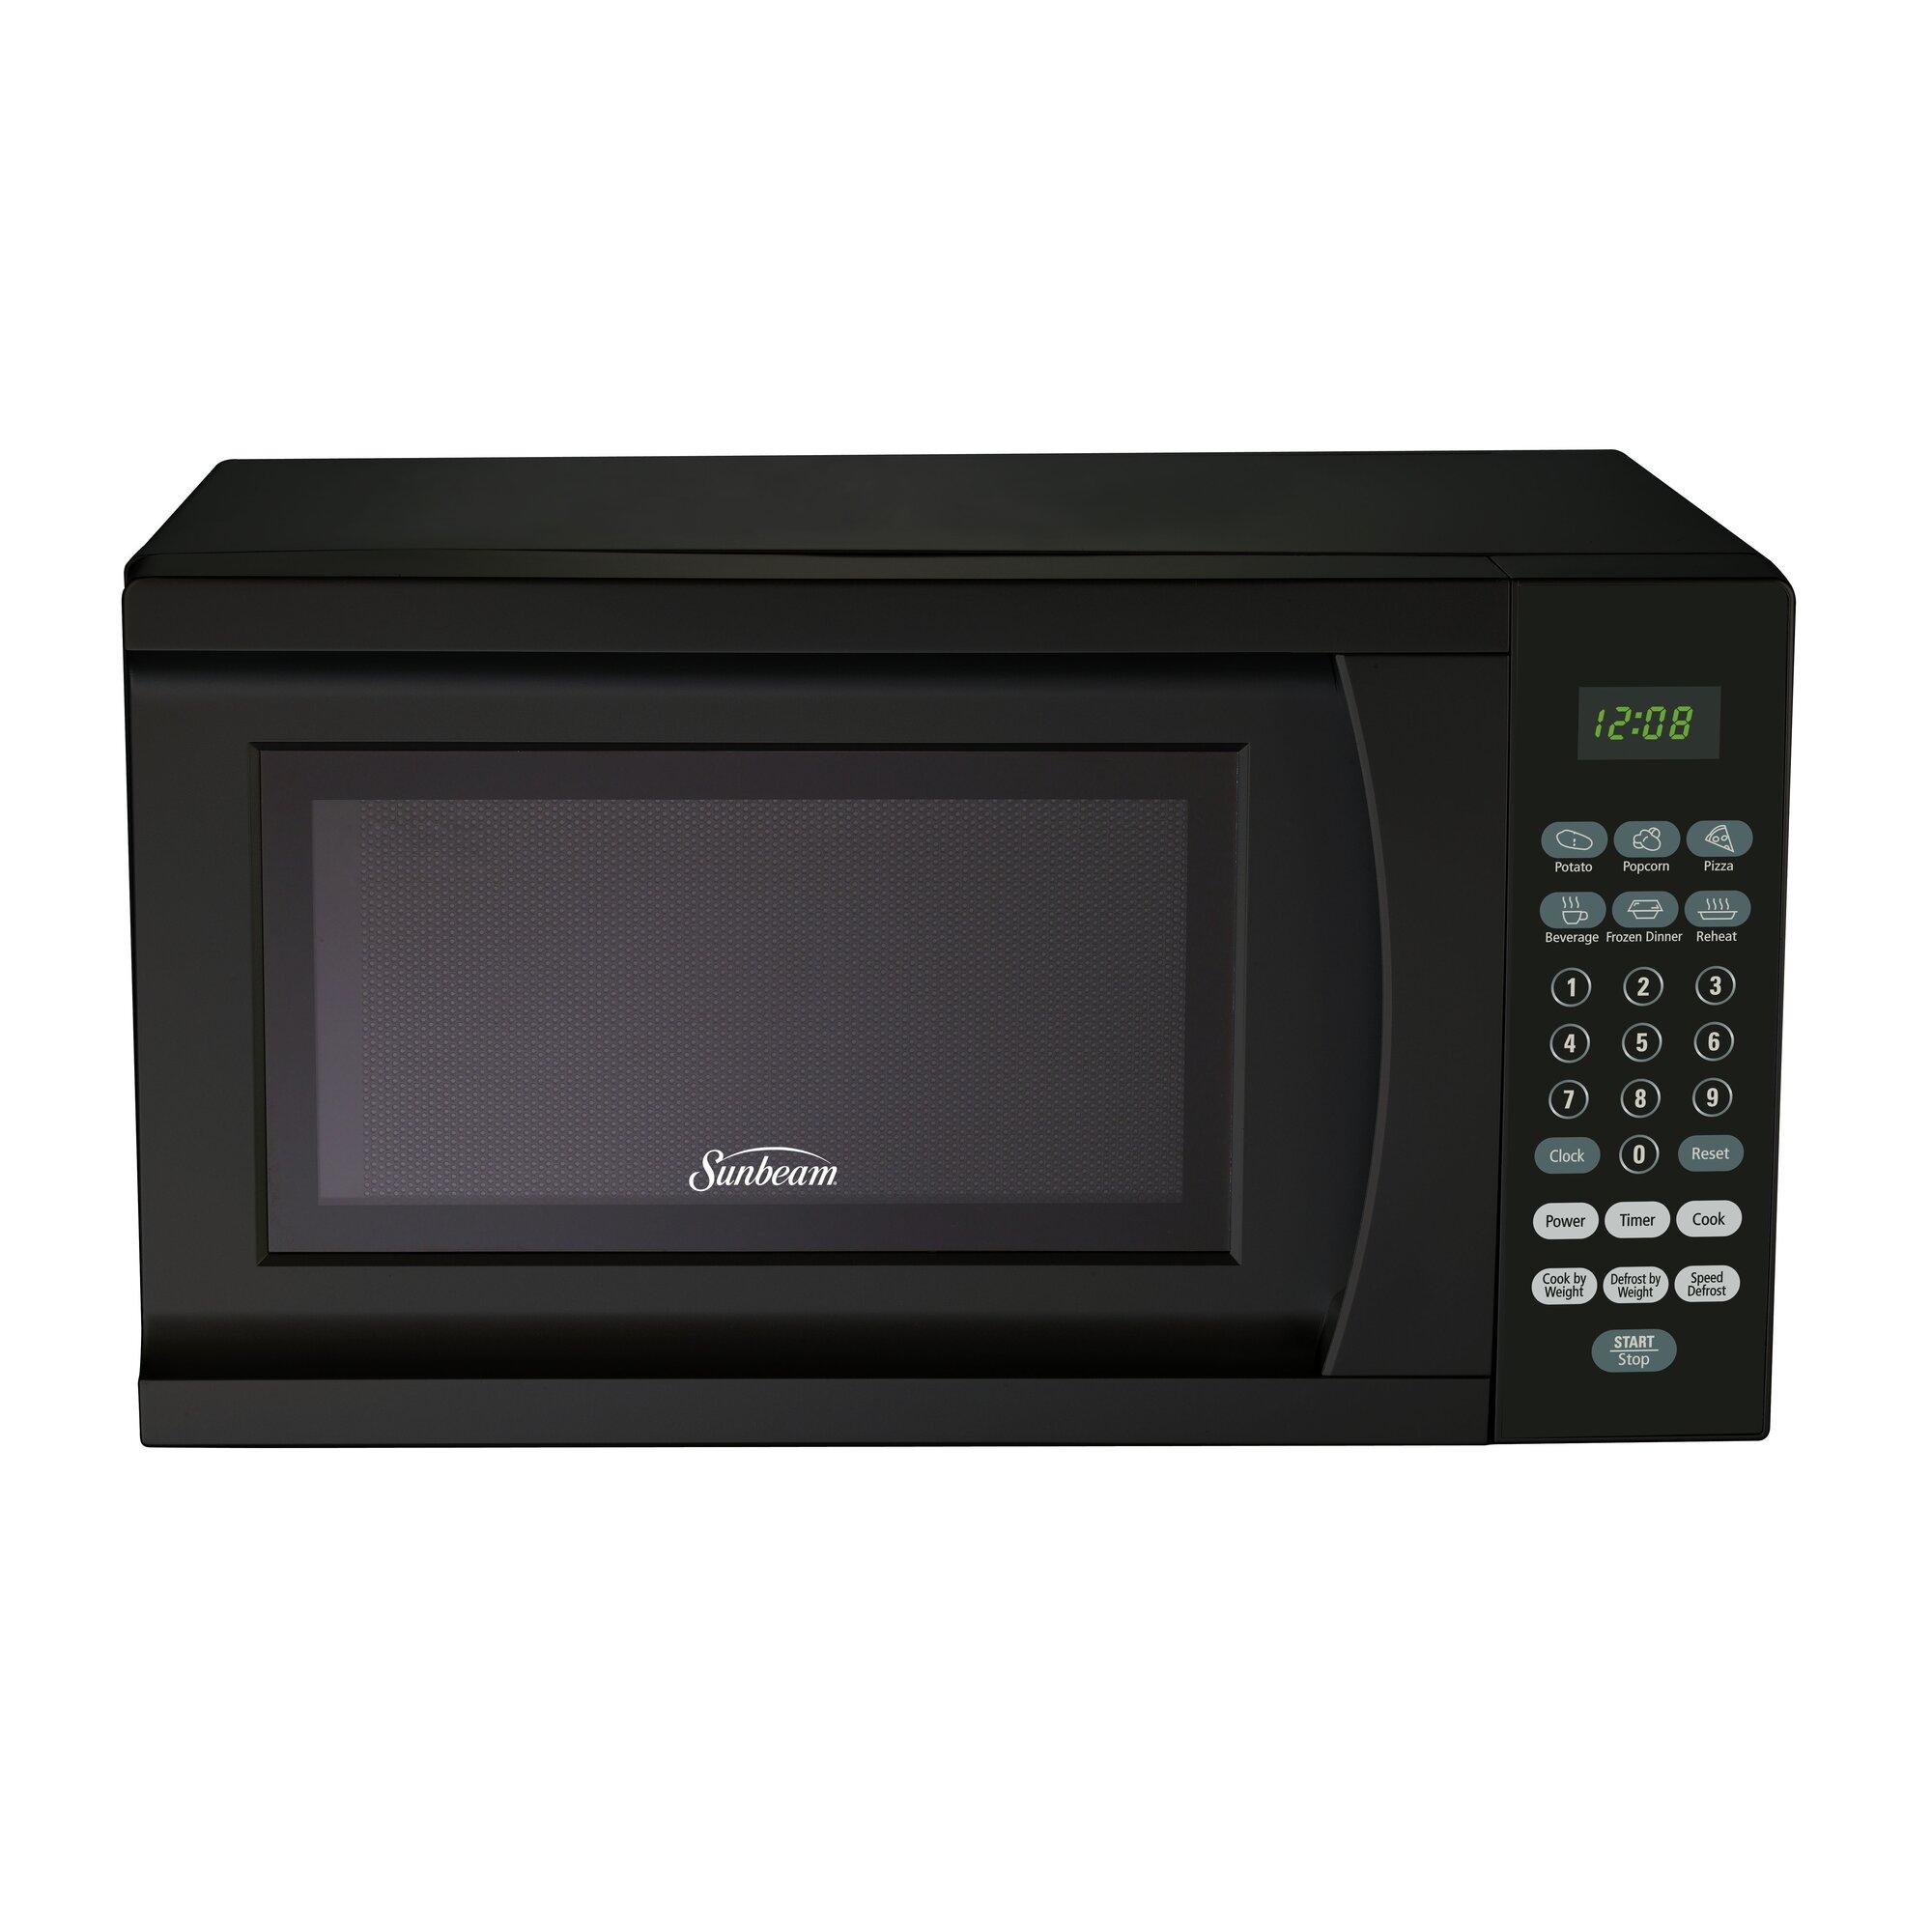 18 0 7 Cu Ft Countertop Microwave